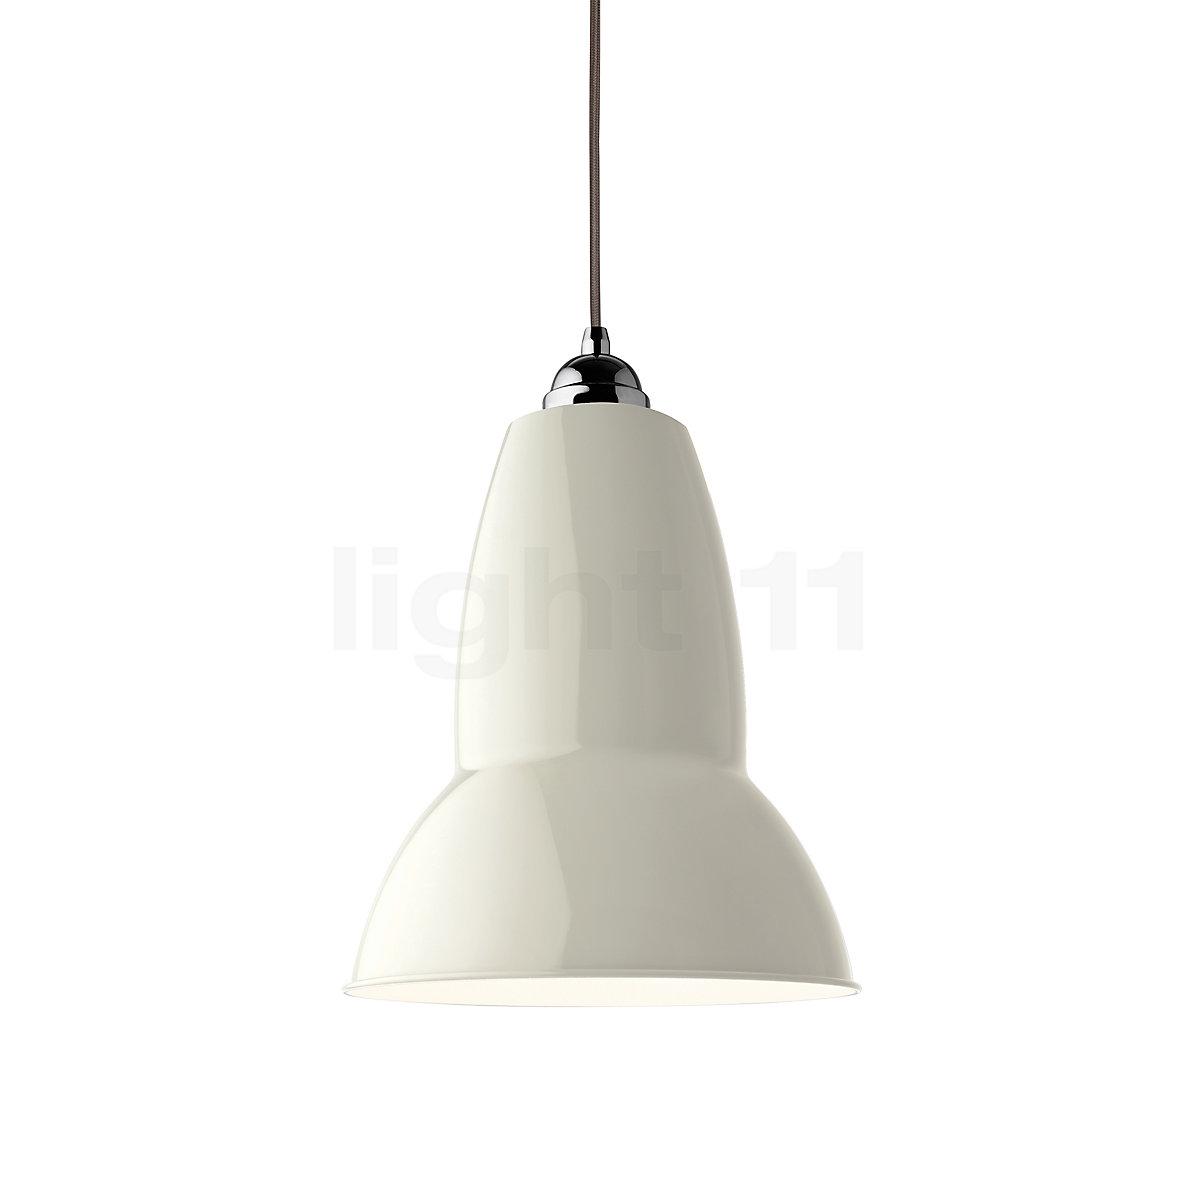 Anglepoise Original 1227 Maxi Pendant Lights At Light11 Eu